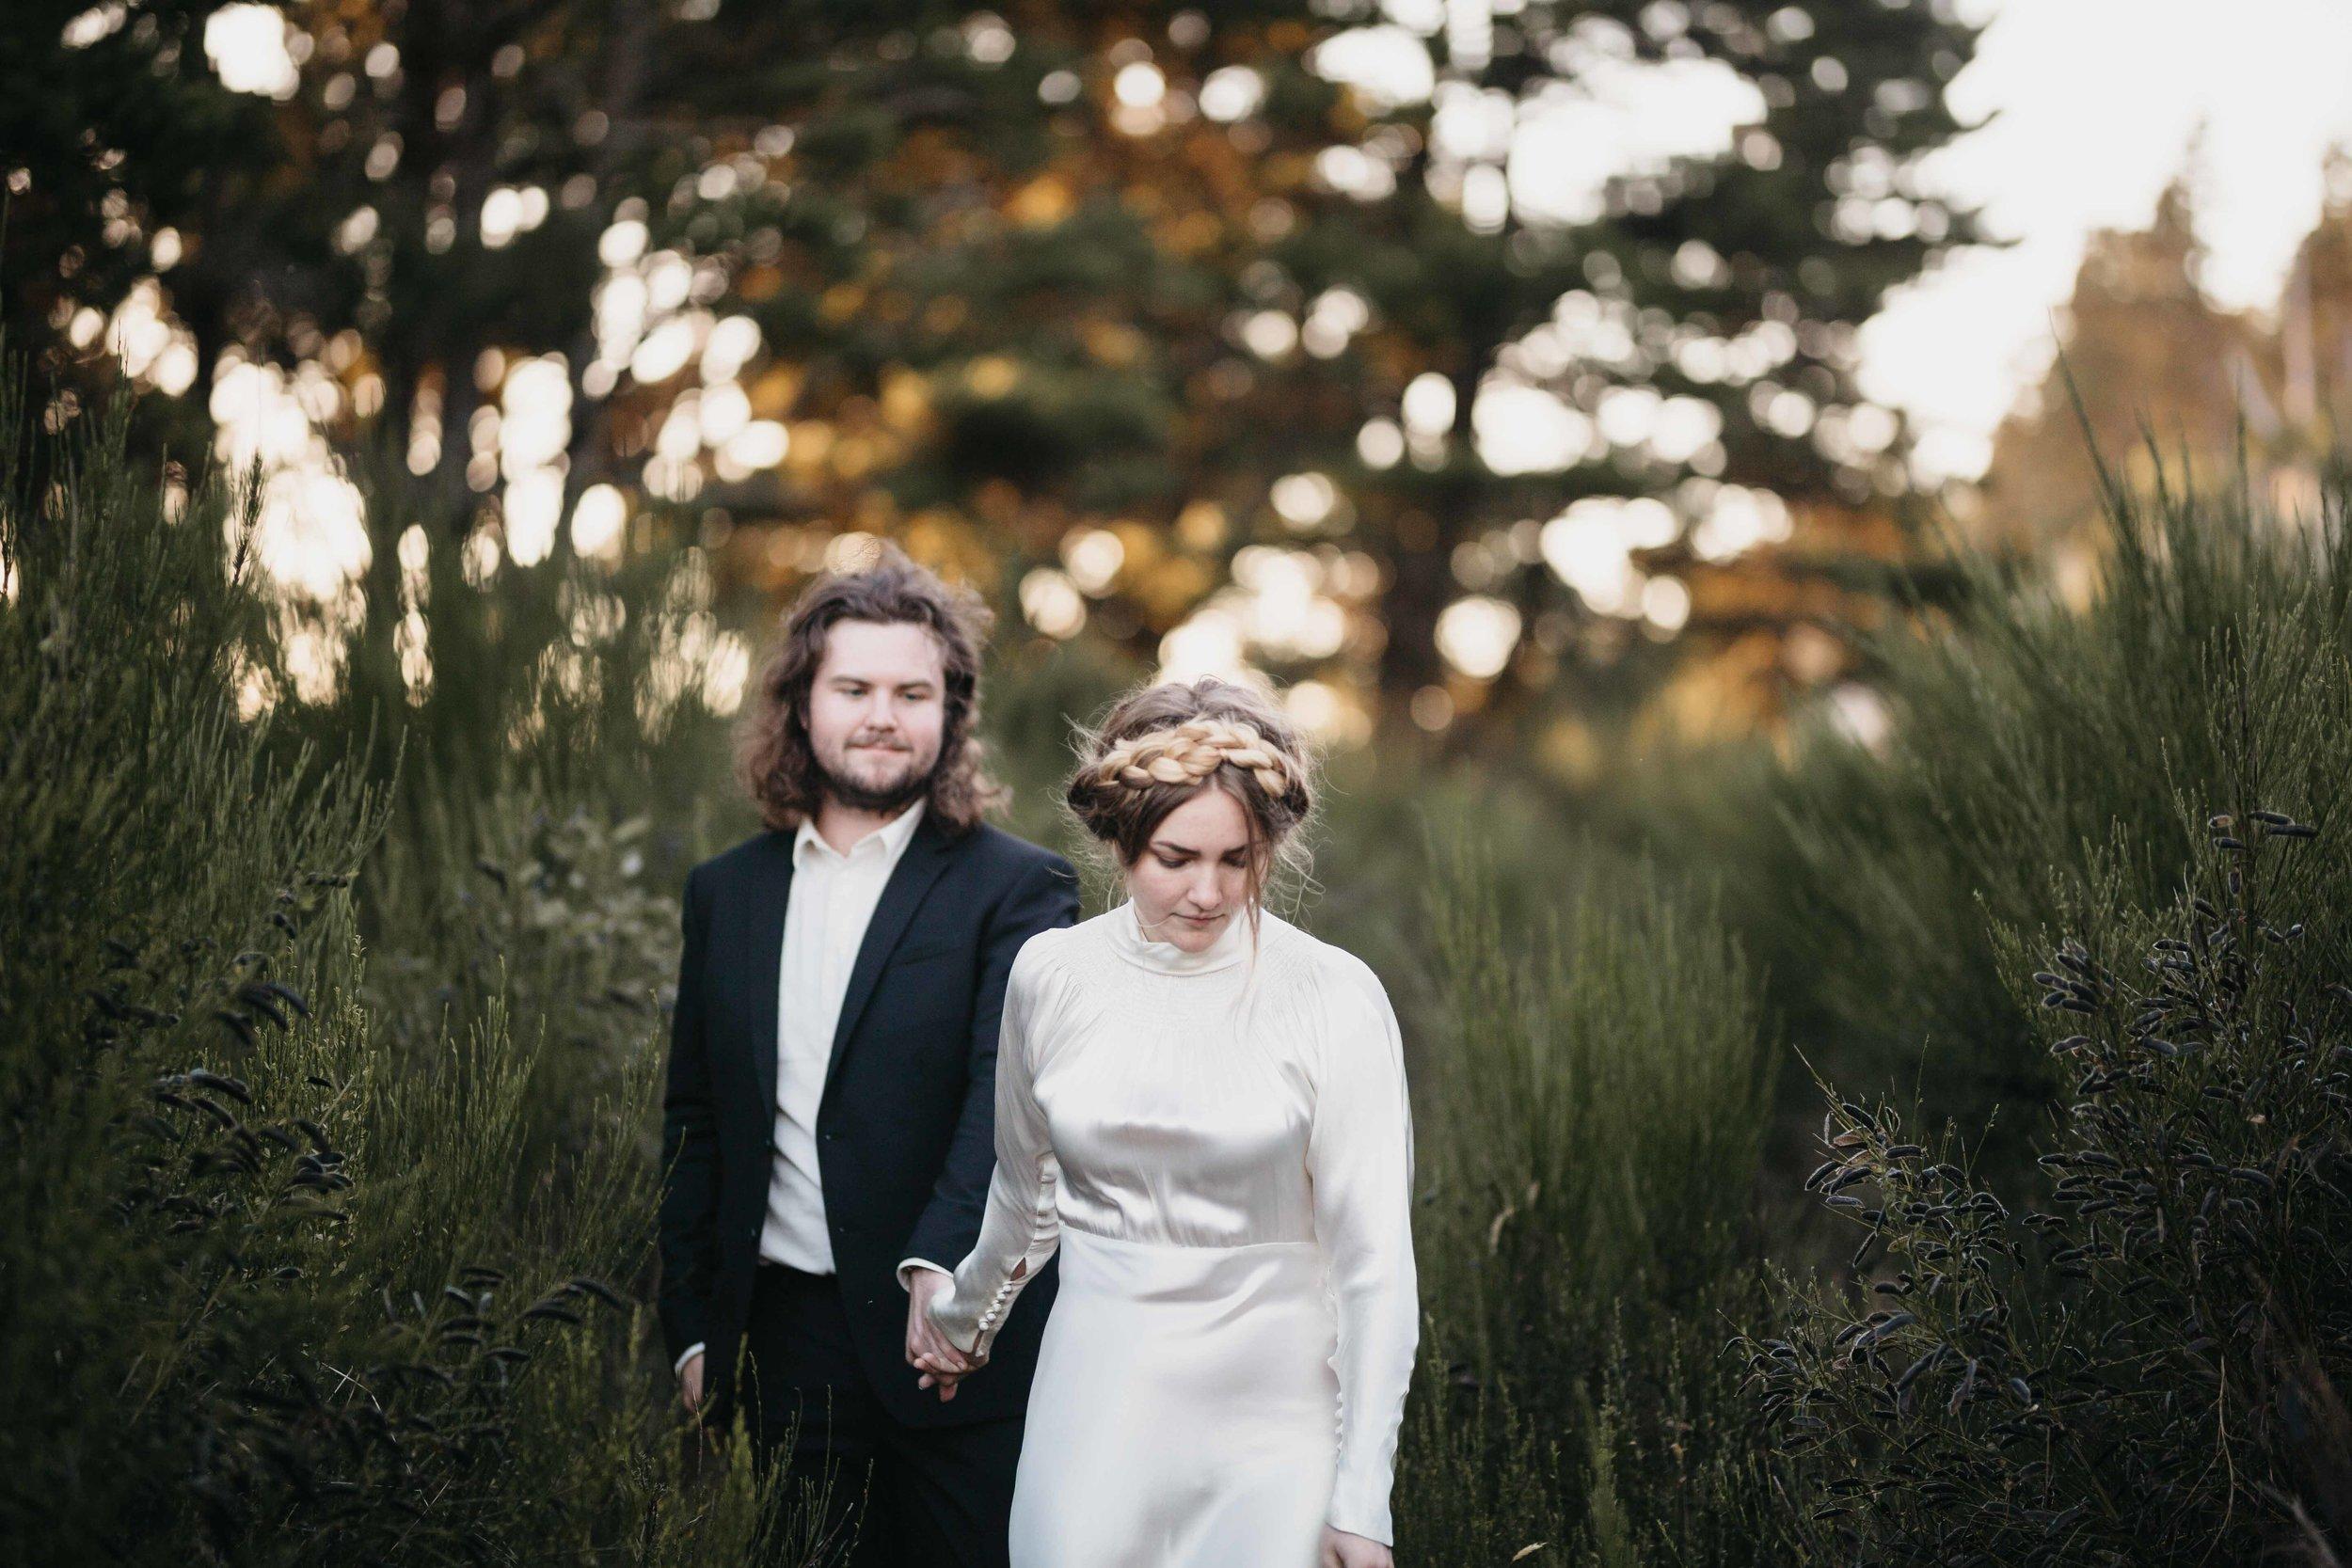 Oregon-Wedding-Photographer-8.jpg